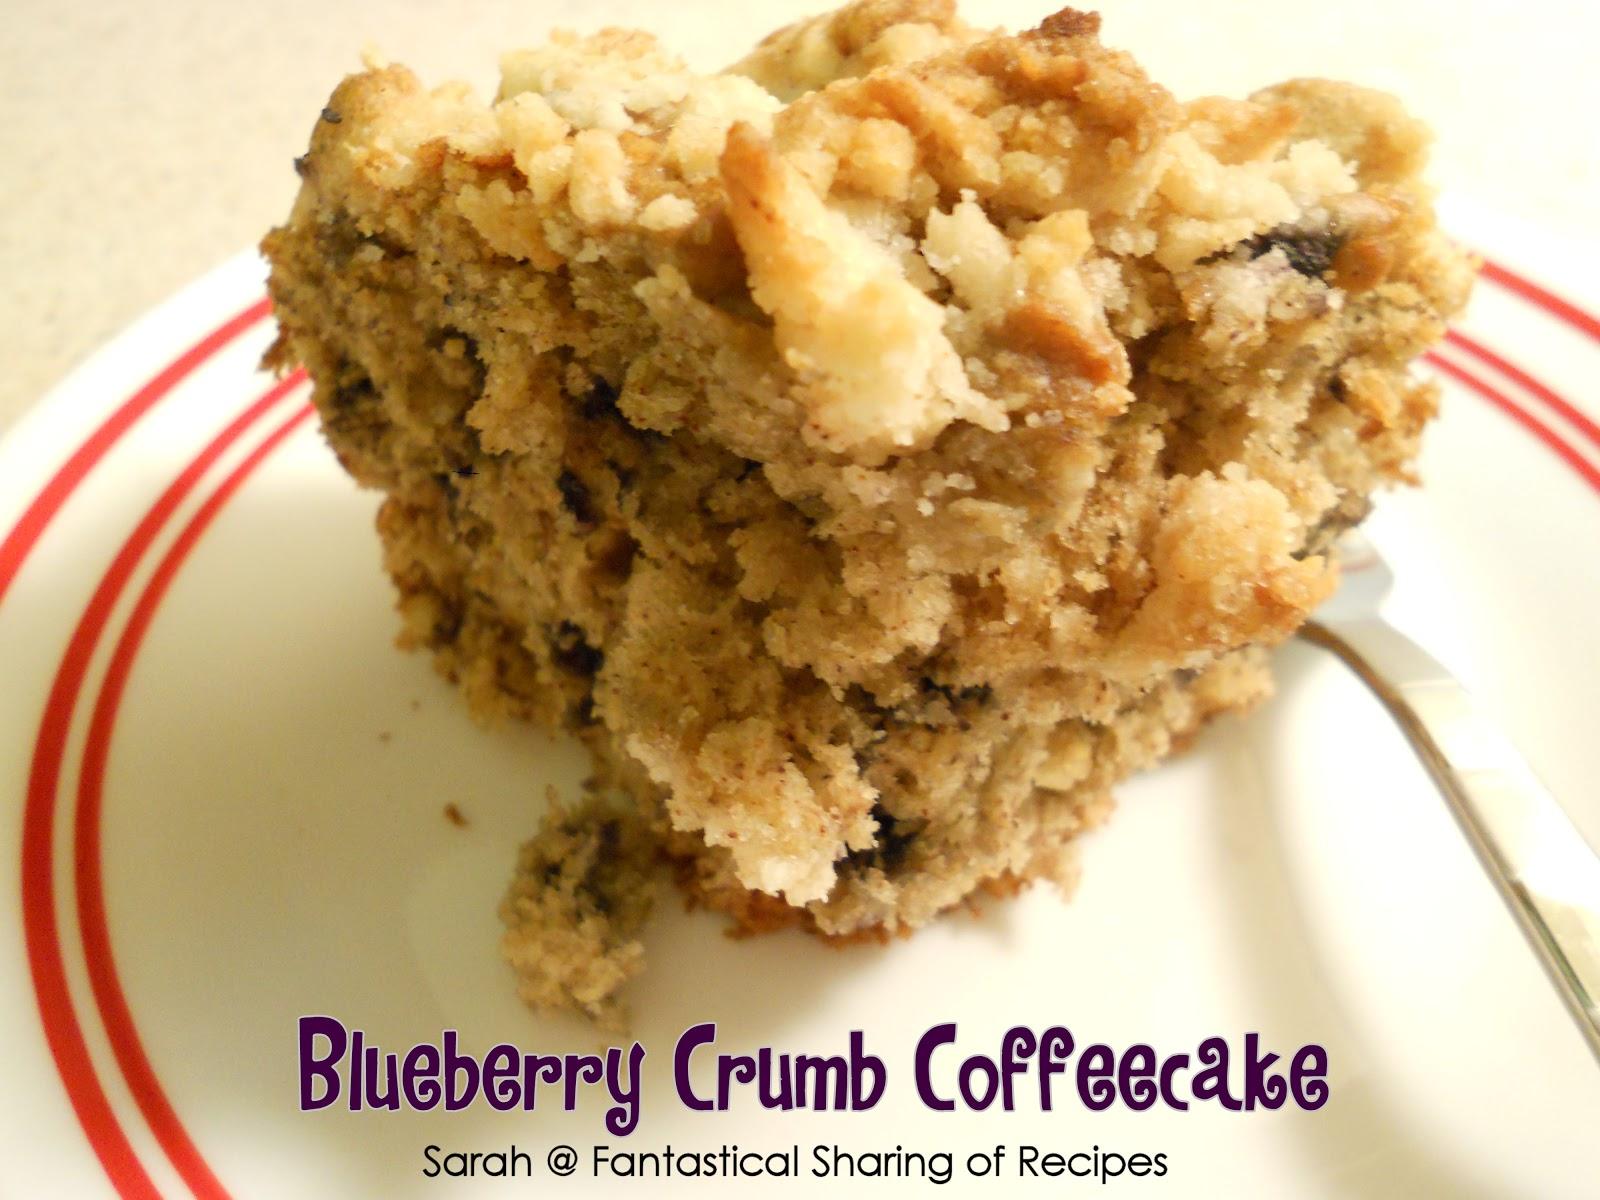 Fantastical Sharing of Recipes: Blueberry Crumb Coffeecake